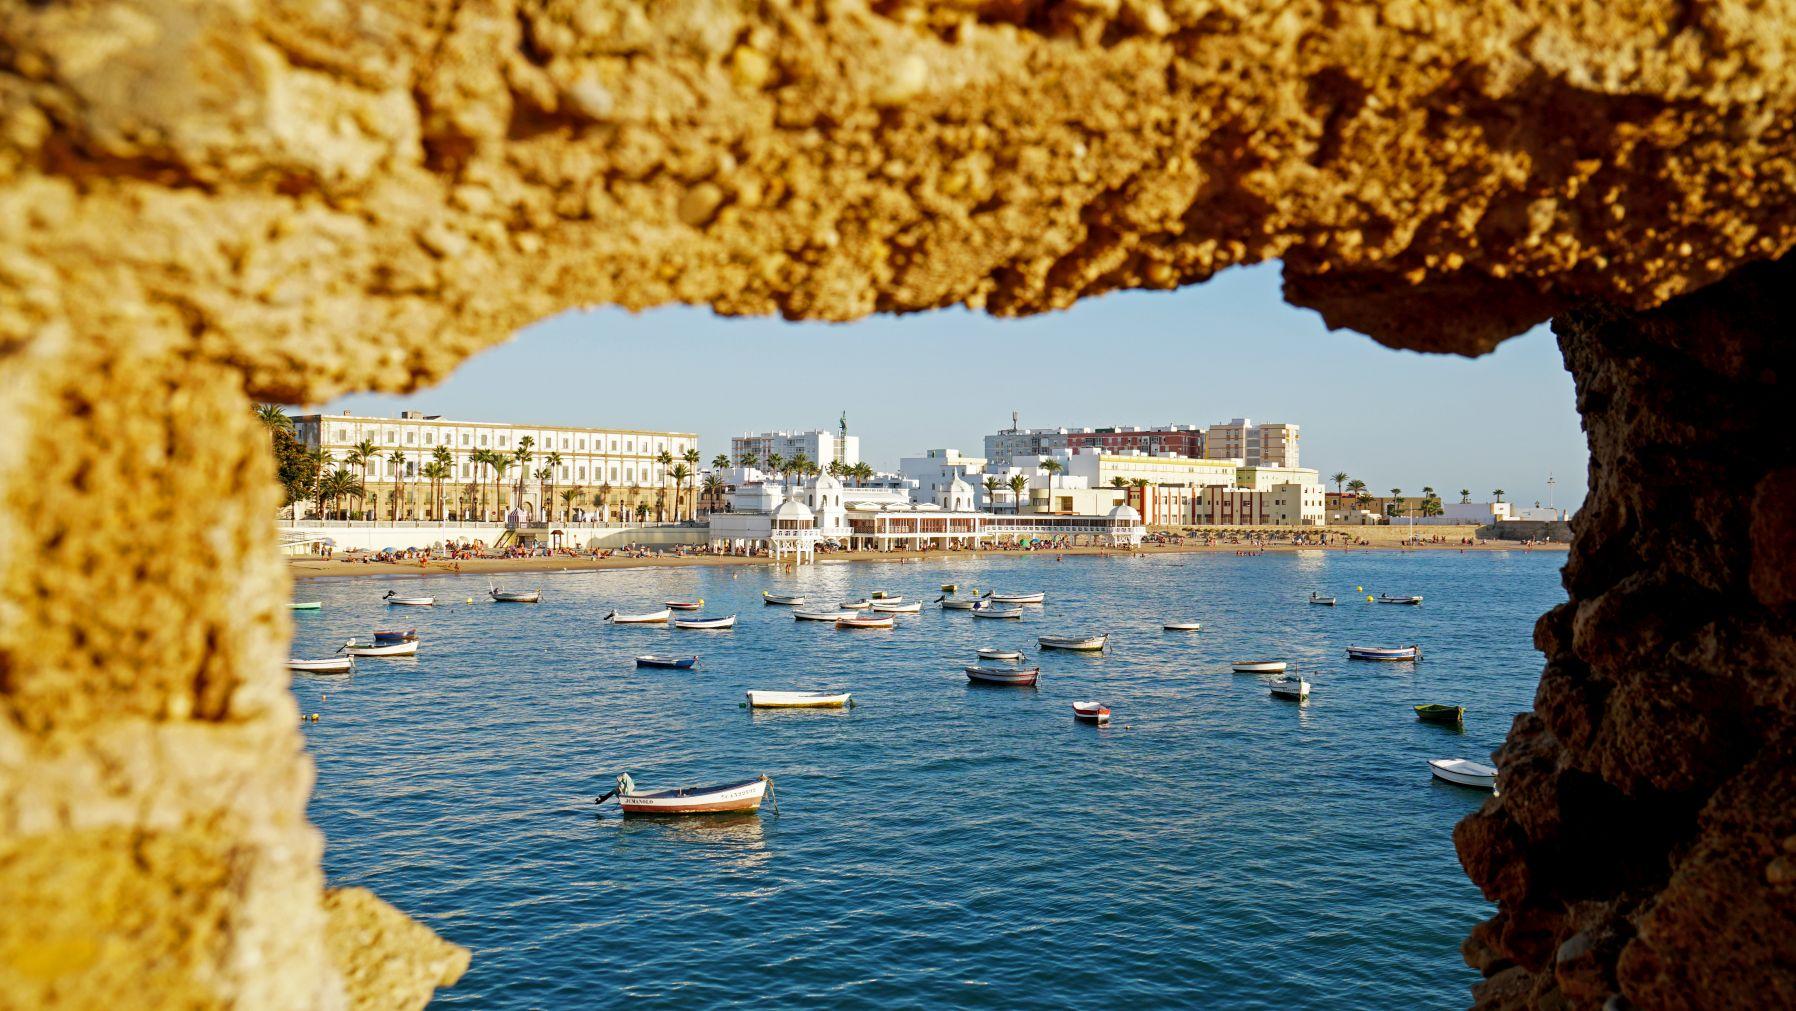 Strand von Cadiz